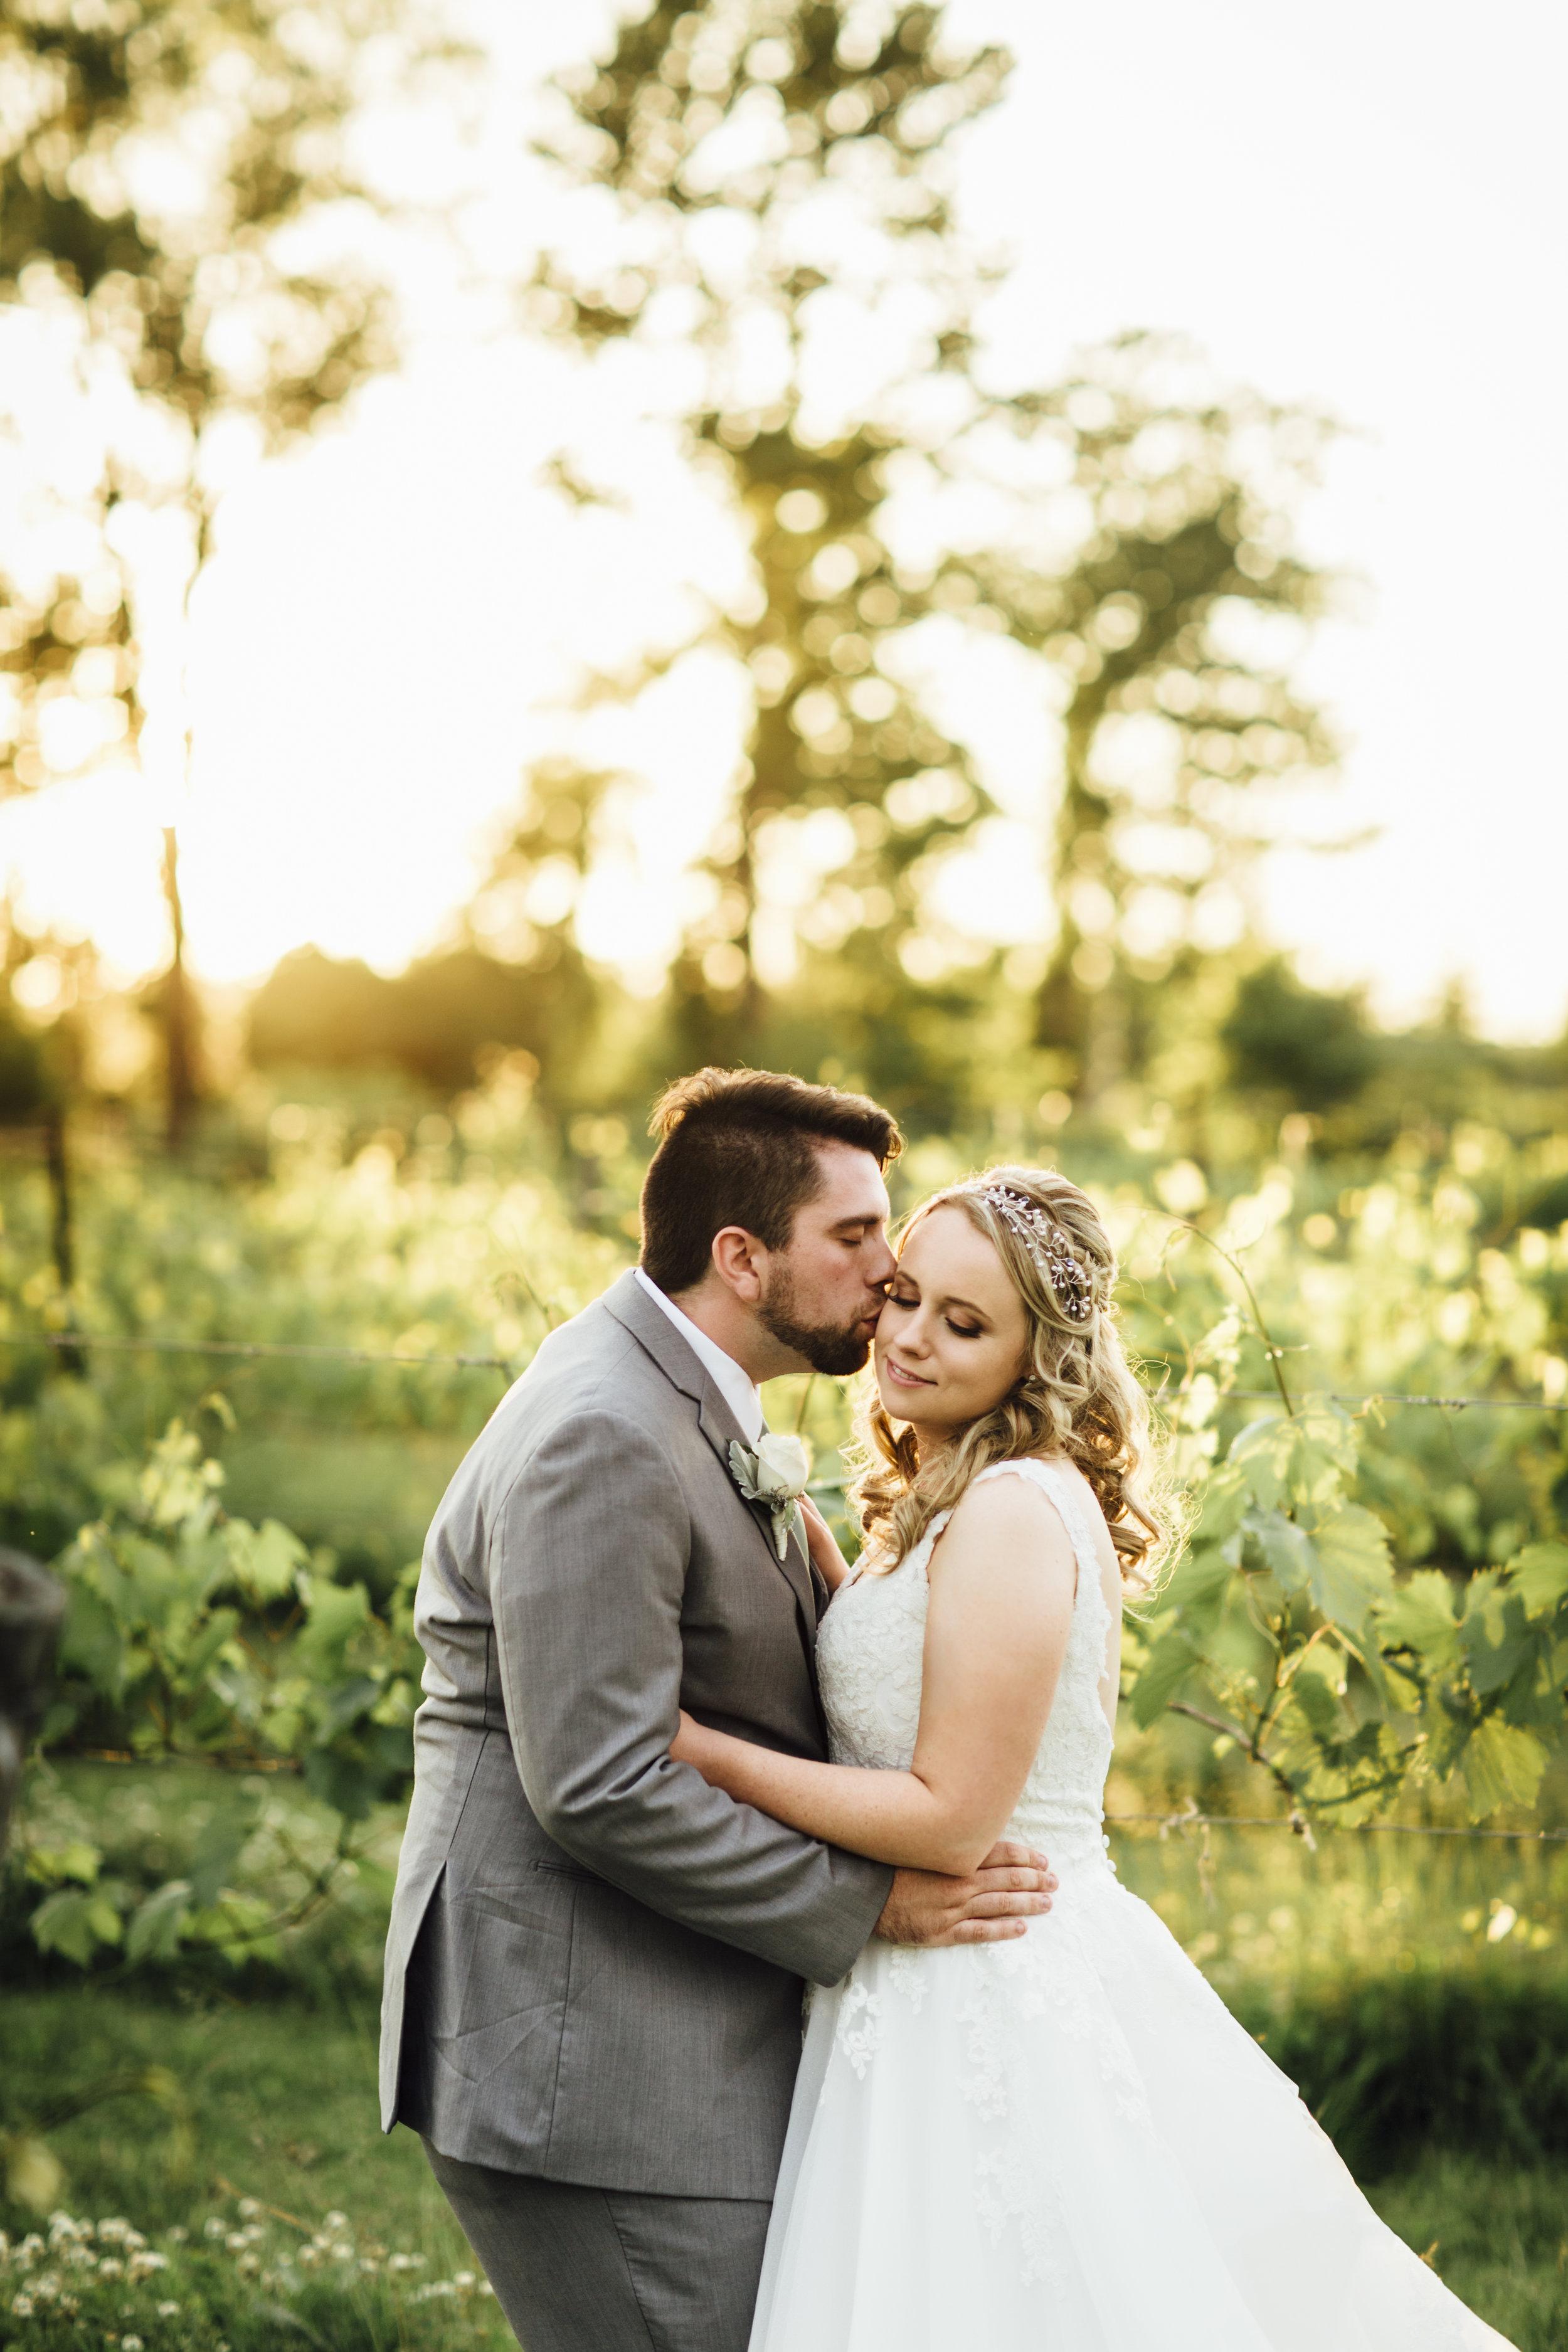 hayleytylerwedding-1131-Edit.jpg